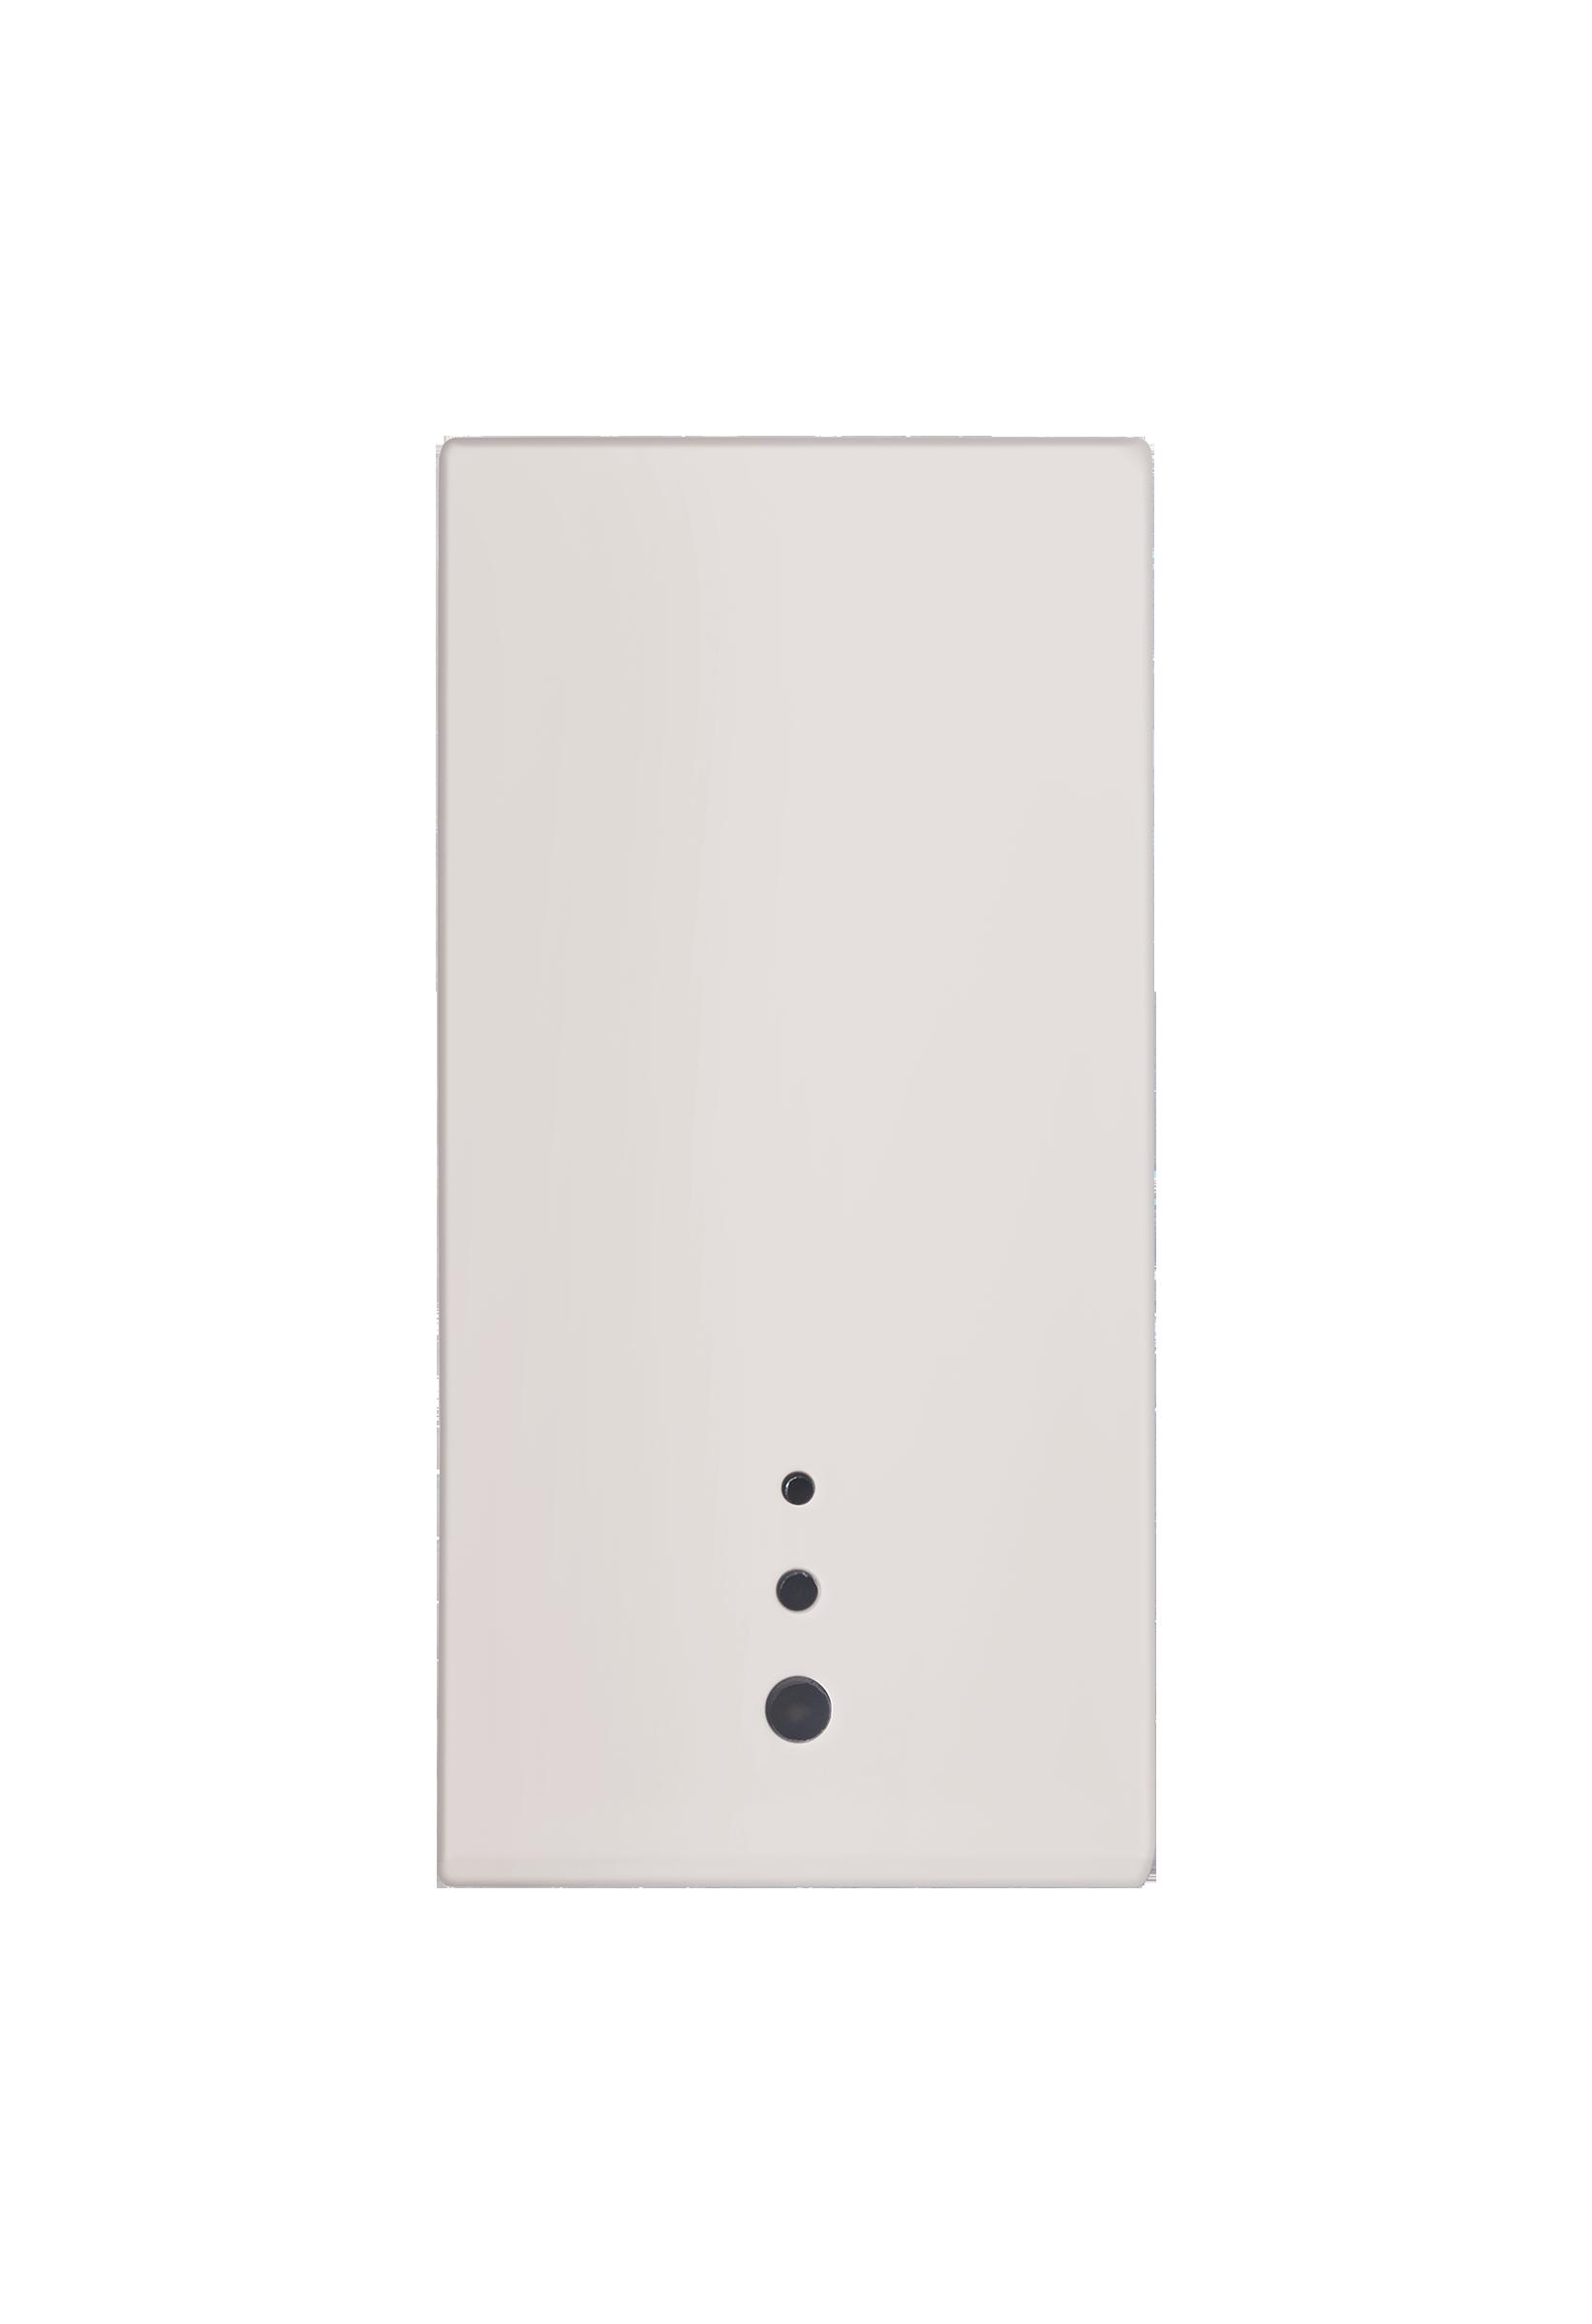 Myrius Nextgen 6A Switch 1 Way 1M With Indicator White